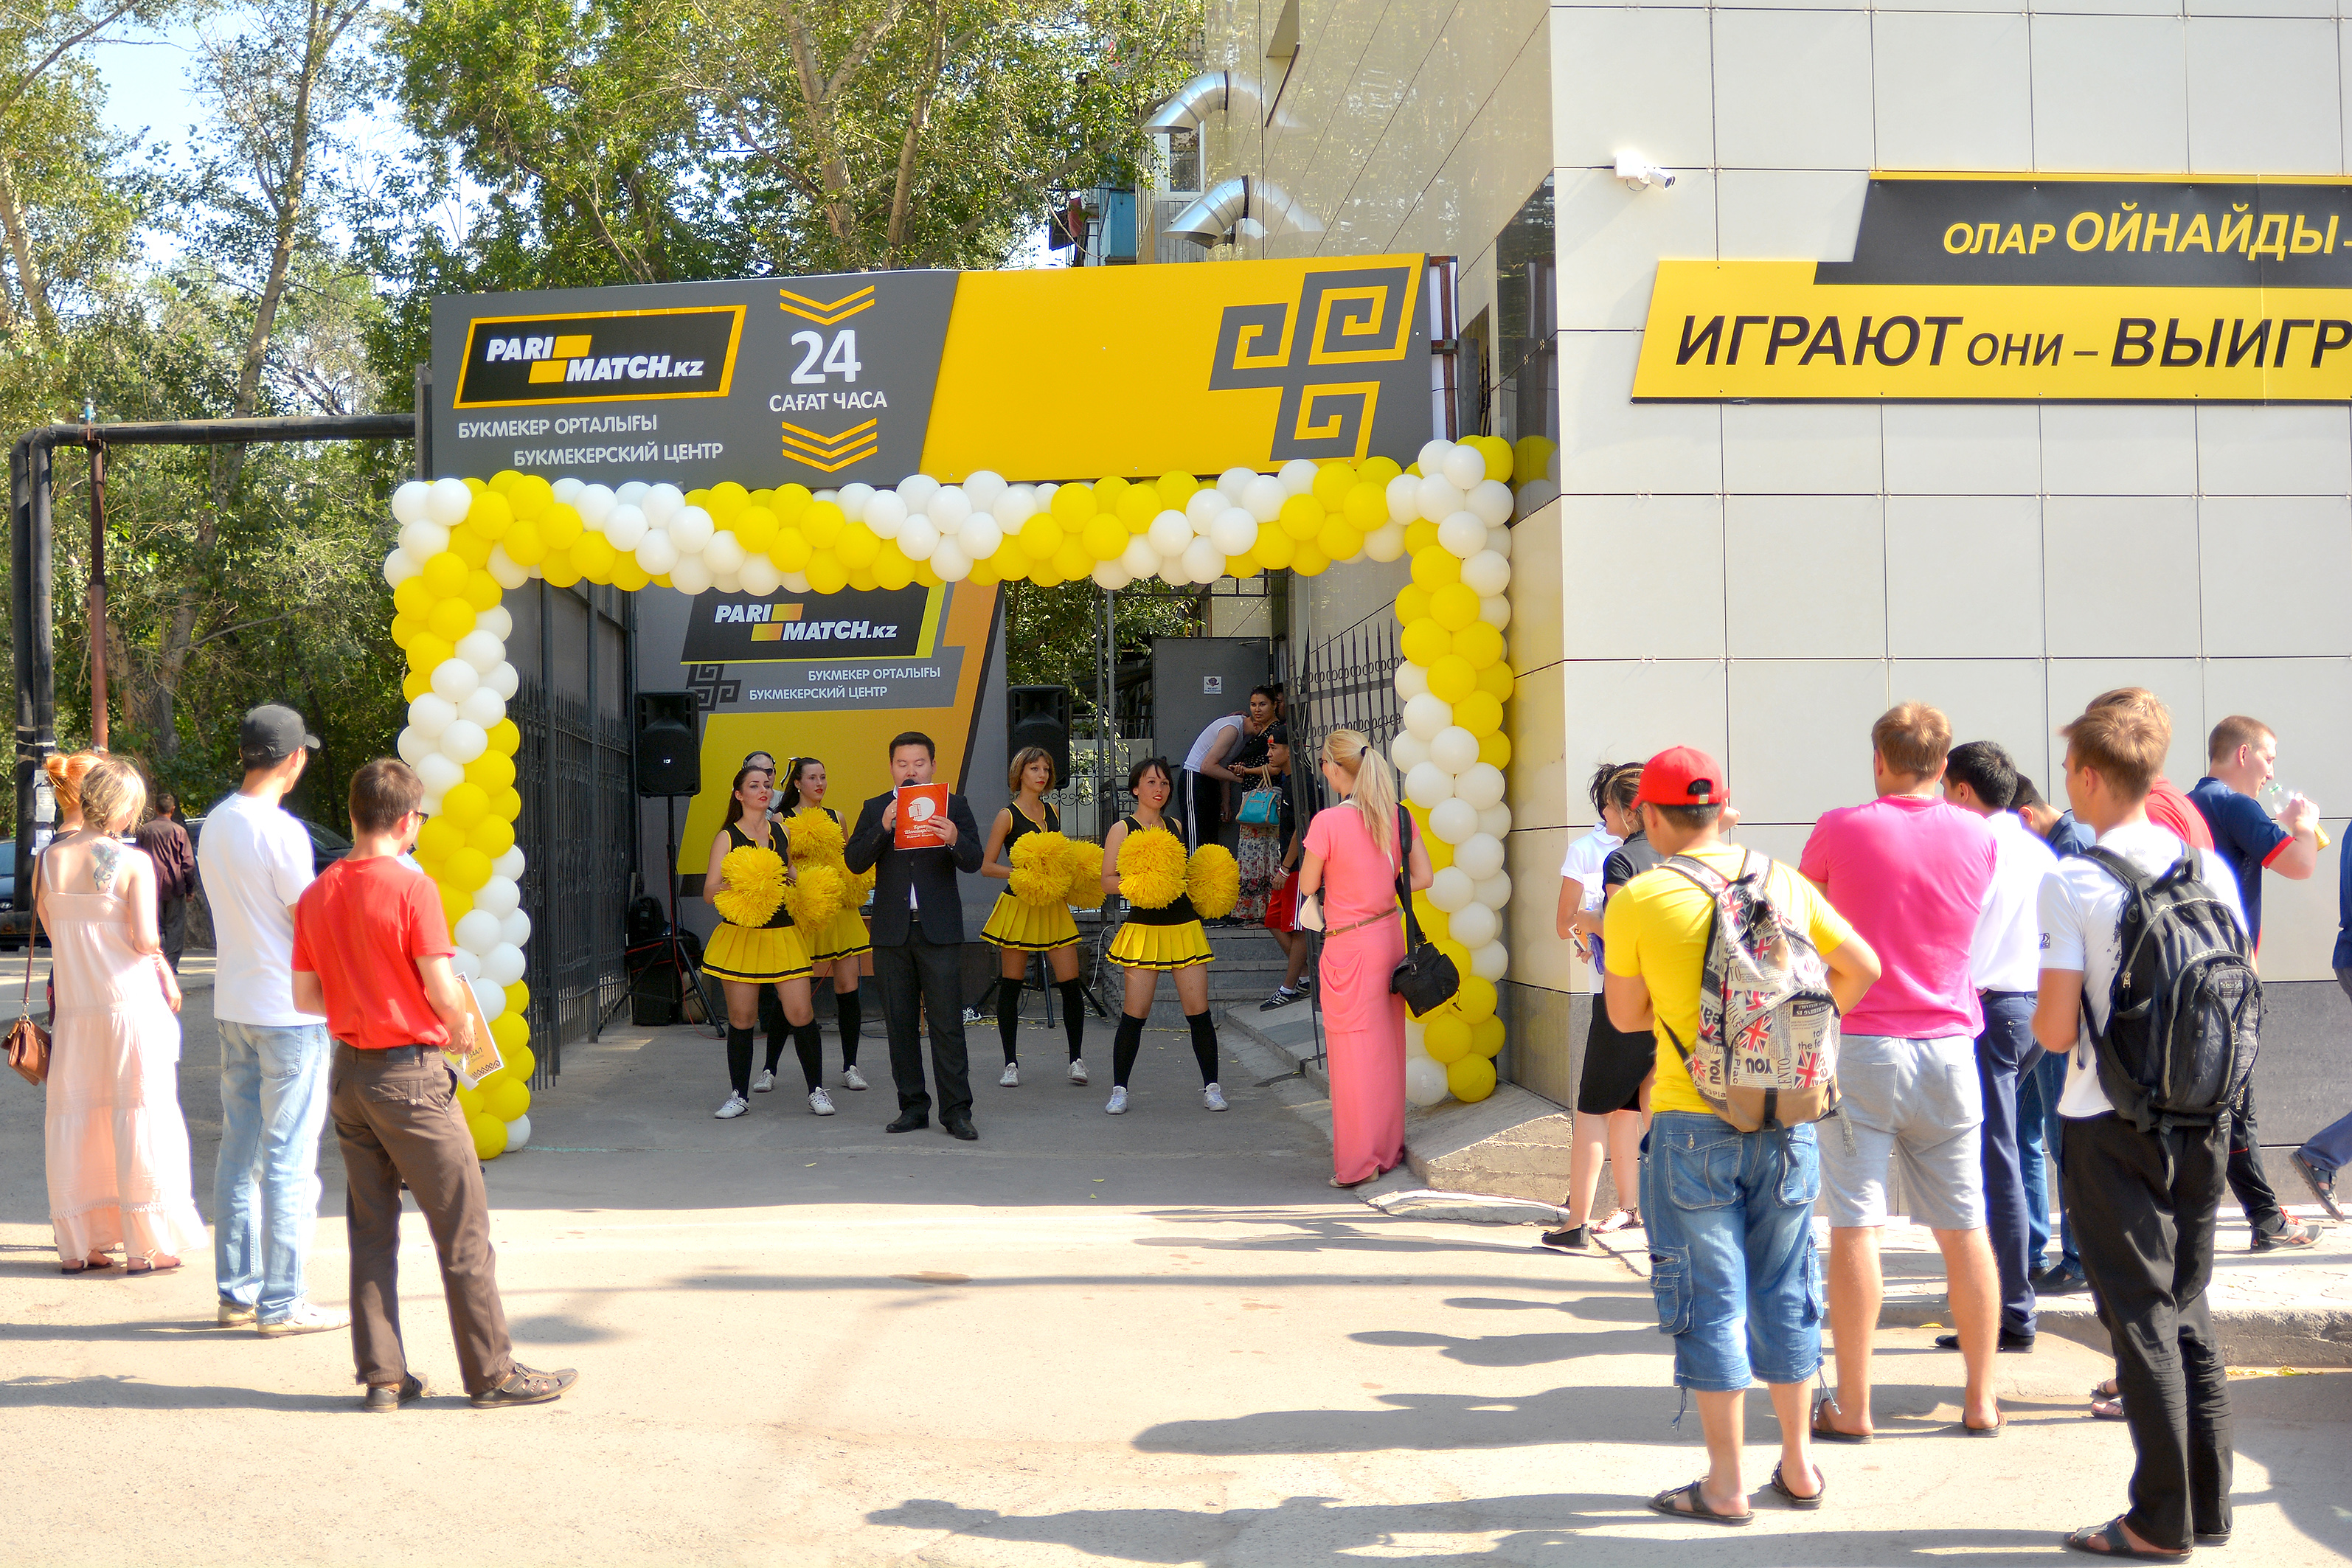 В Казахстане открыта двенадцатая касса «Пари-Матч»